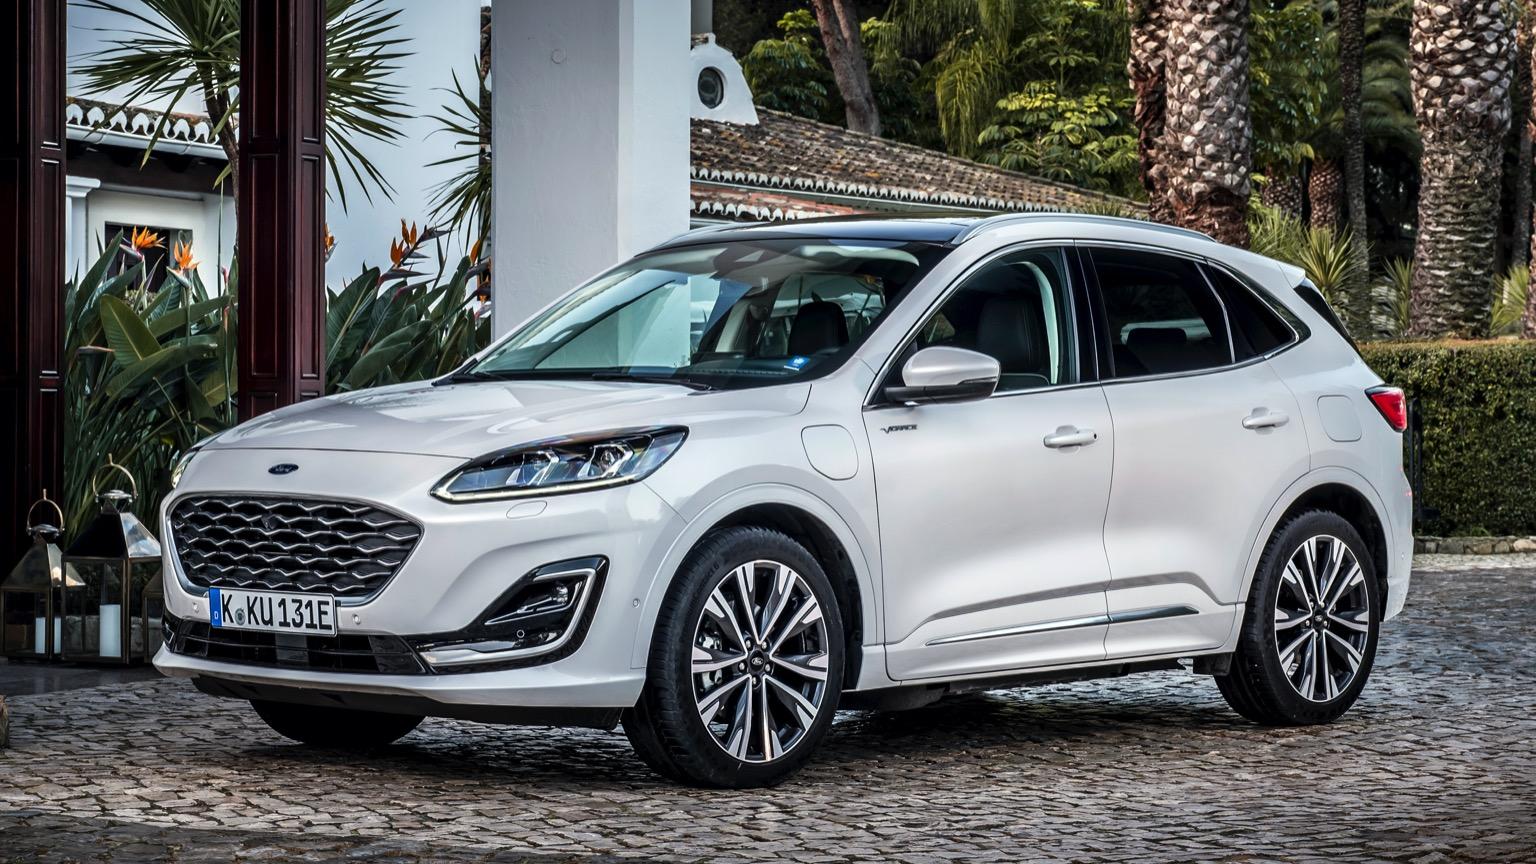 Ford Kuga Plug-in Hybrid (2019)